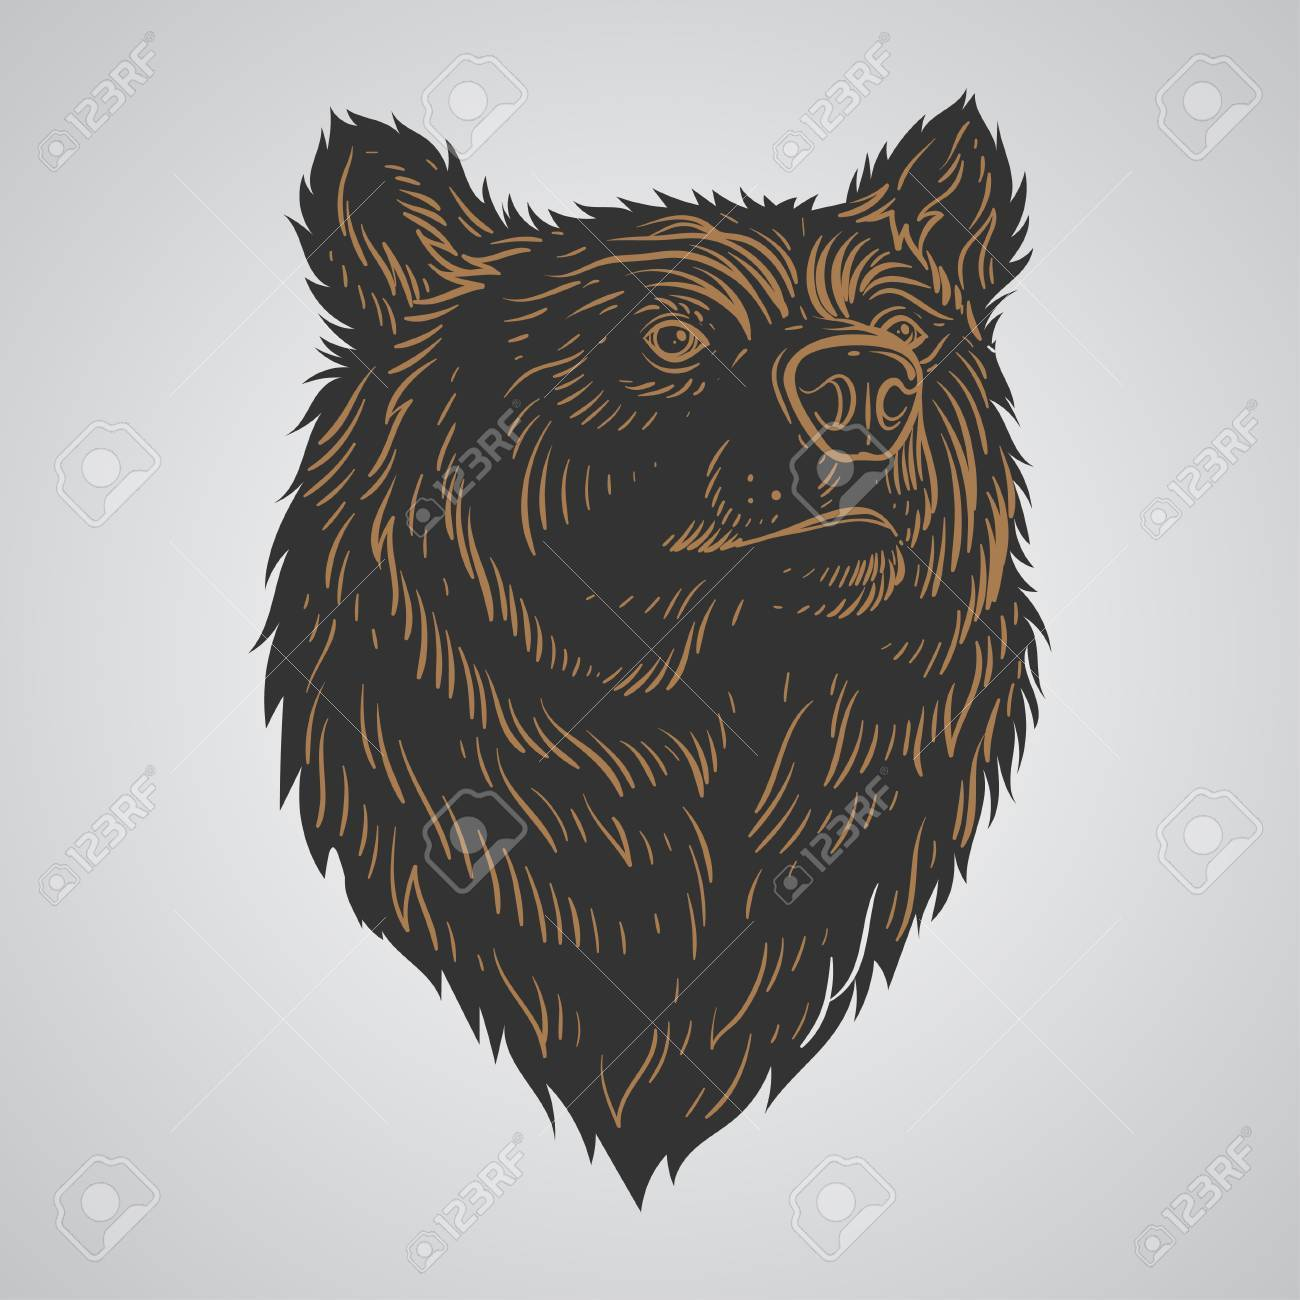 1300x1300 Bear Head Hand Draw Royalty Free Cliparts, Vectors, And Stock